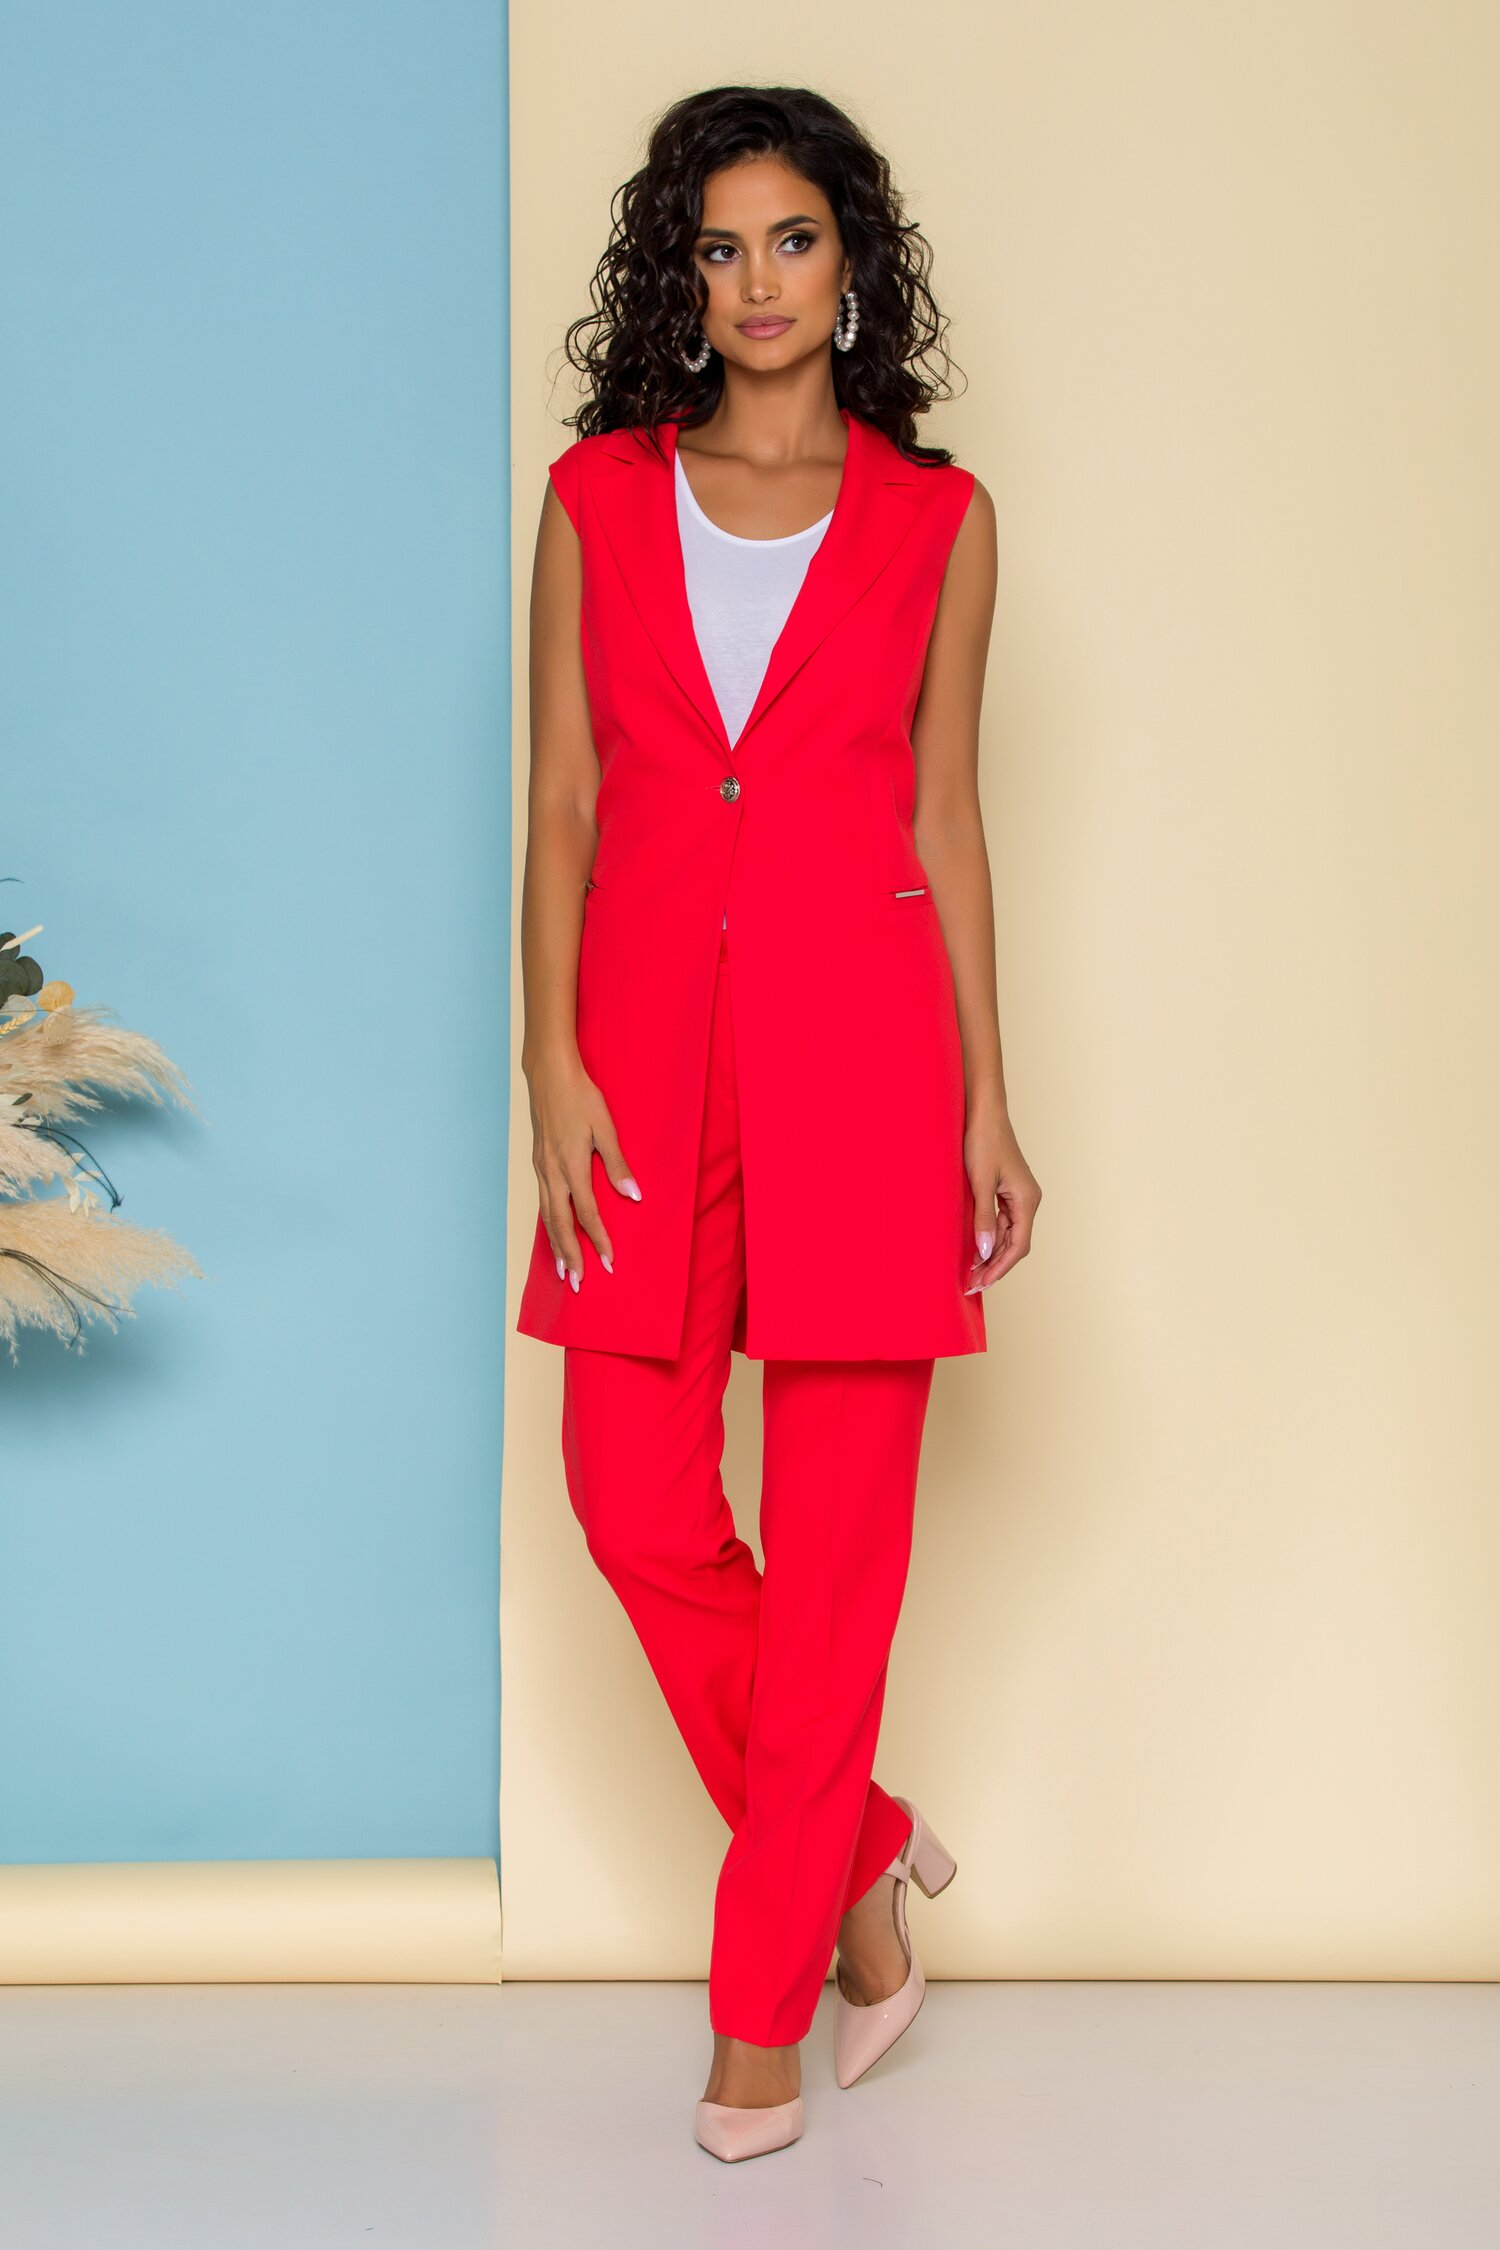 Compleu Sabrina rosu cu sacou lung fara maneci si pantaloni